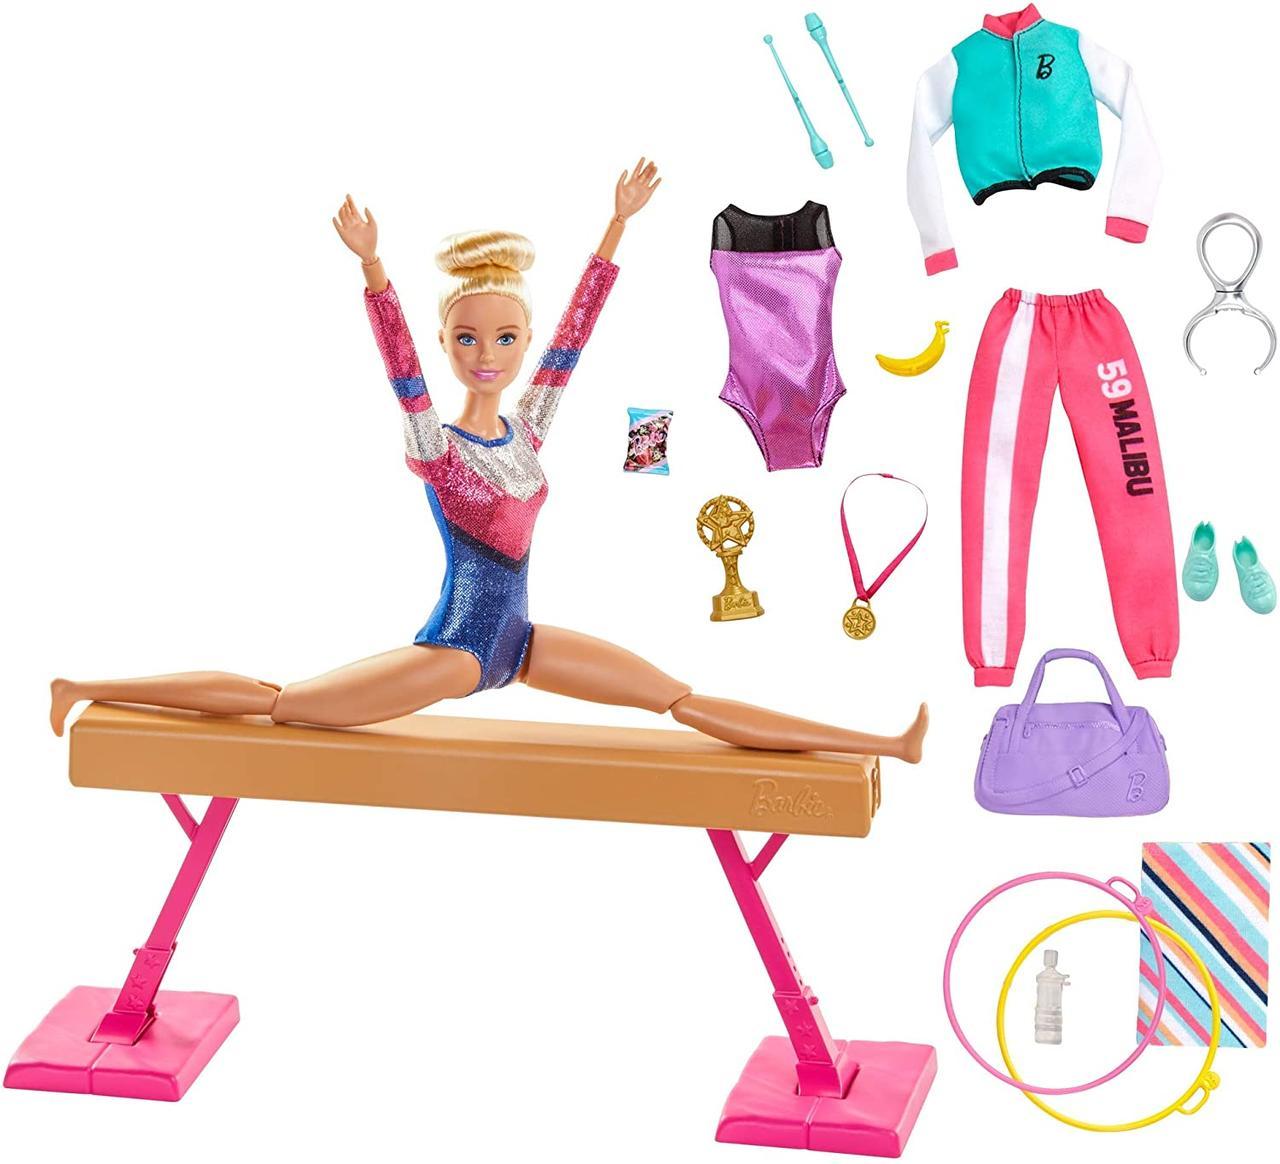 Игровой набор Кукла Барби гимнастка Barbie Gymnastics Playset With Doll, Balance Beam GJM72